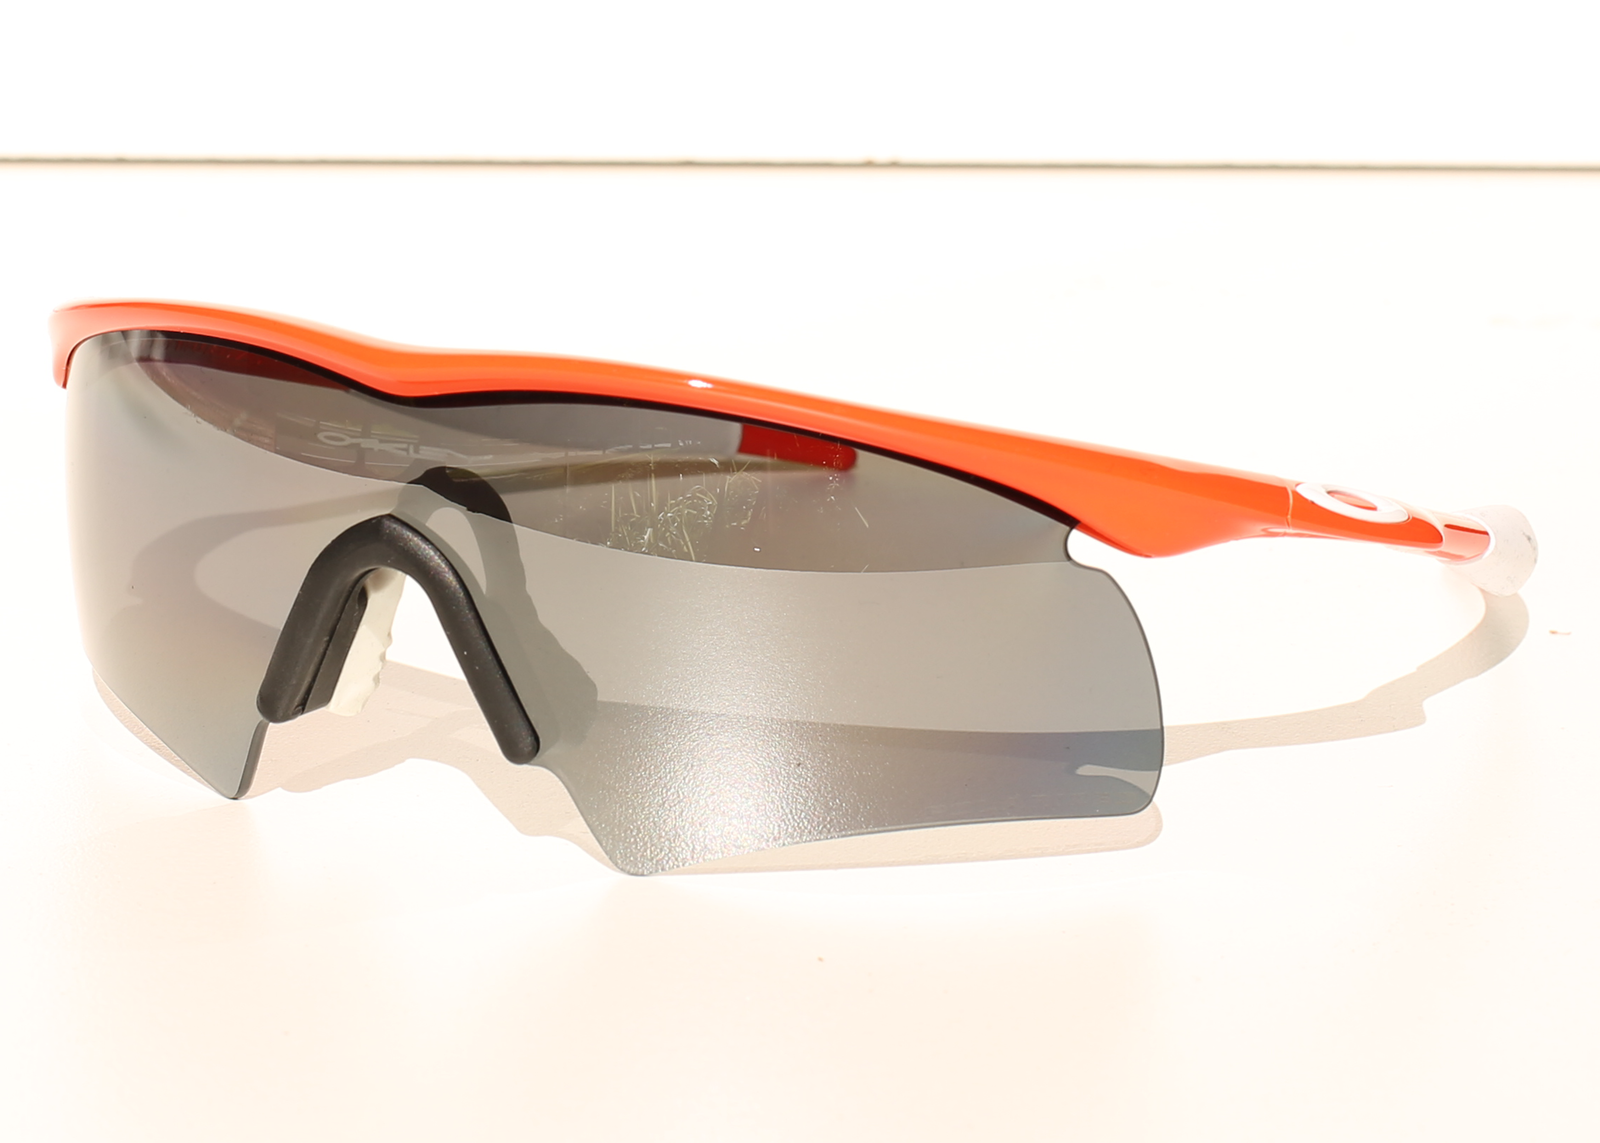 Oakley MPH M-Frame, Team Orange frames, and 50 similar items